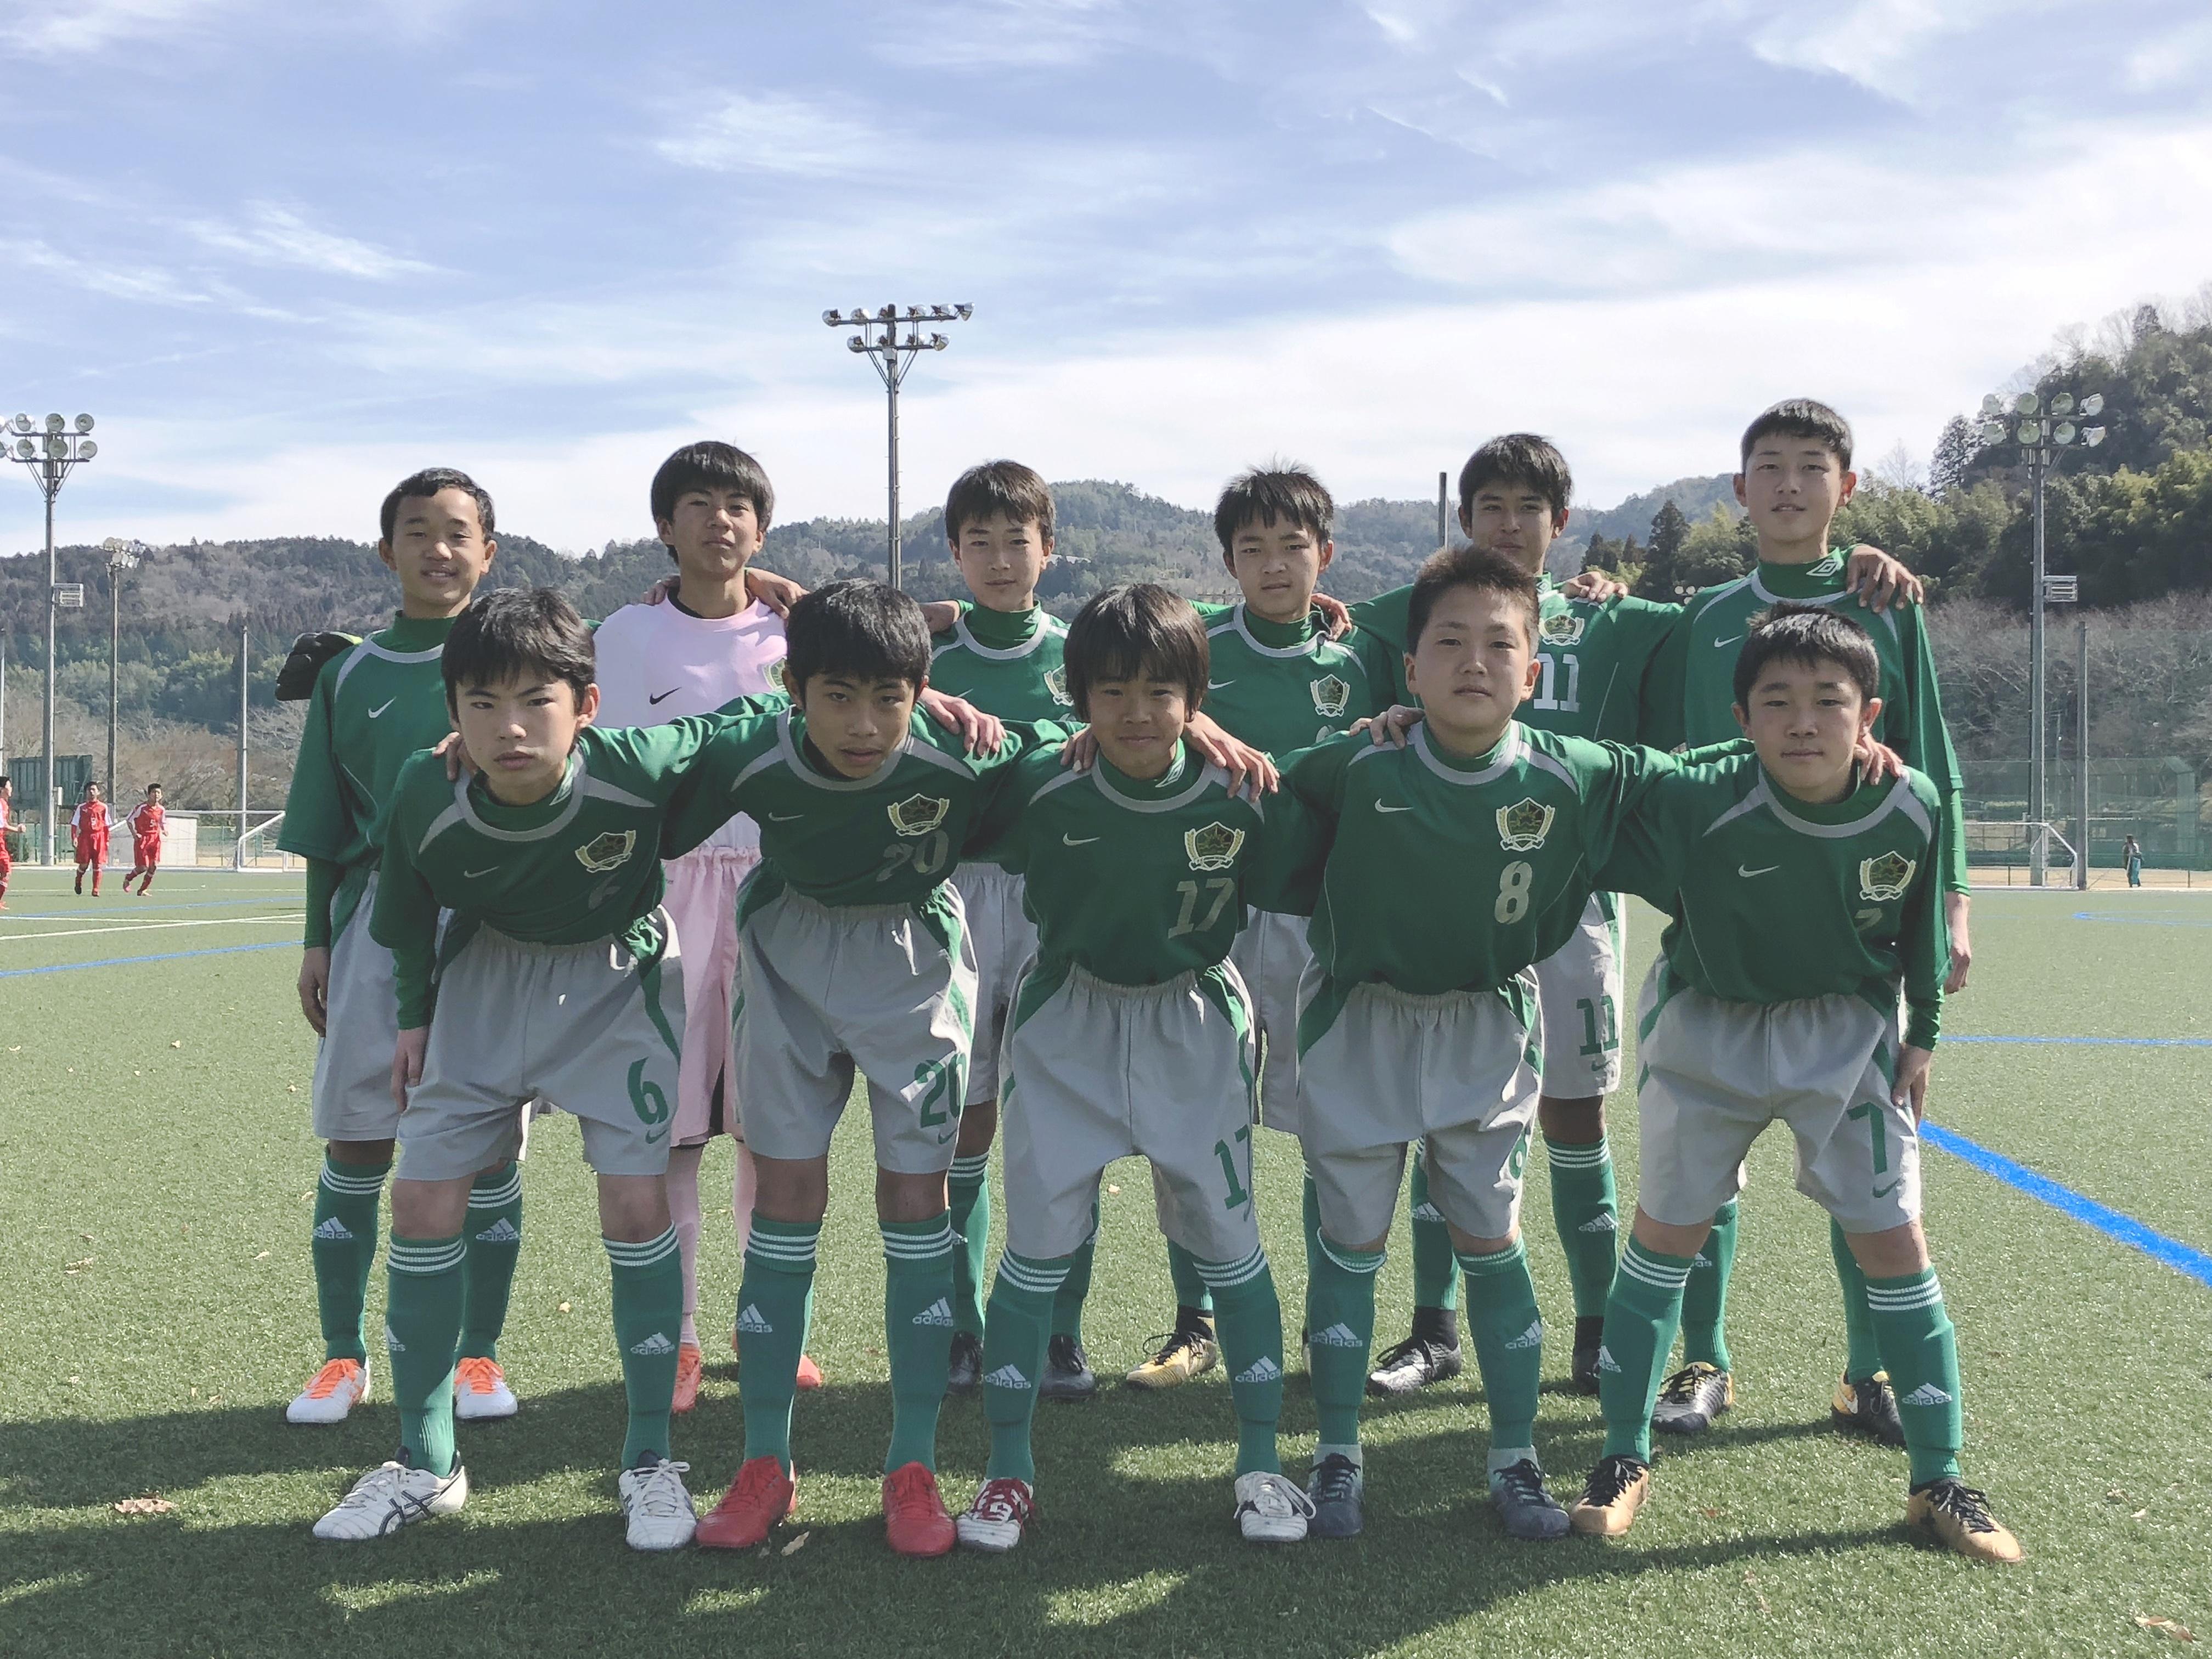 FCオリベ多治見ジュニアユースBチーム 2018年度岐阜県U15リーグ3部 試合結果